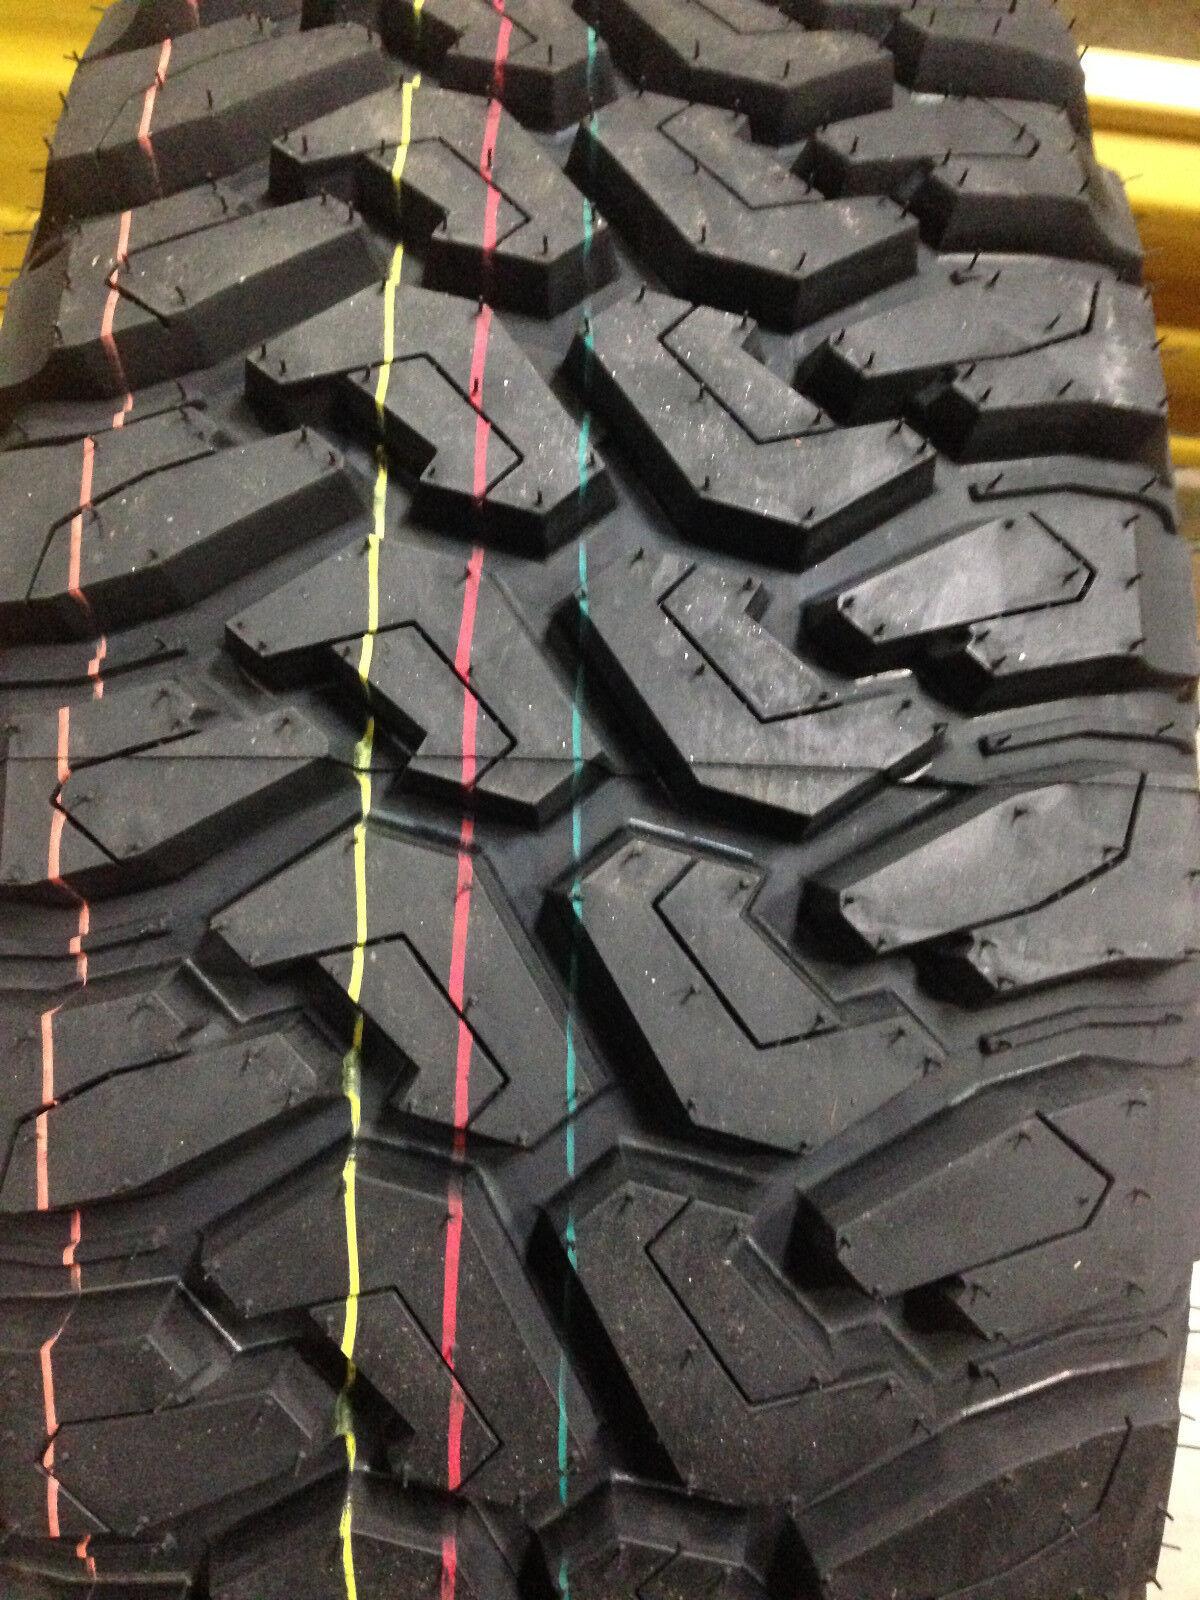 Owner 4 NEW 265/70R17 Centennial Dirt Commander M/T Mud Tires MT 265 70 17 R17 2657017